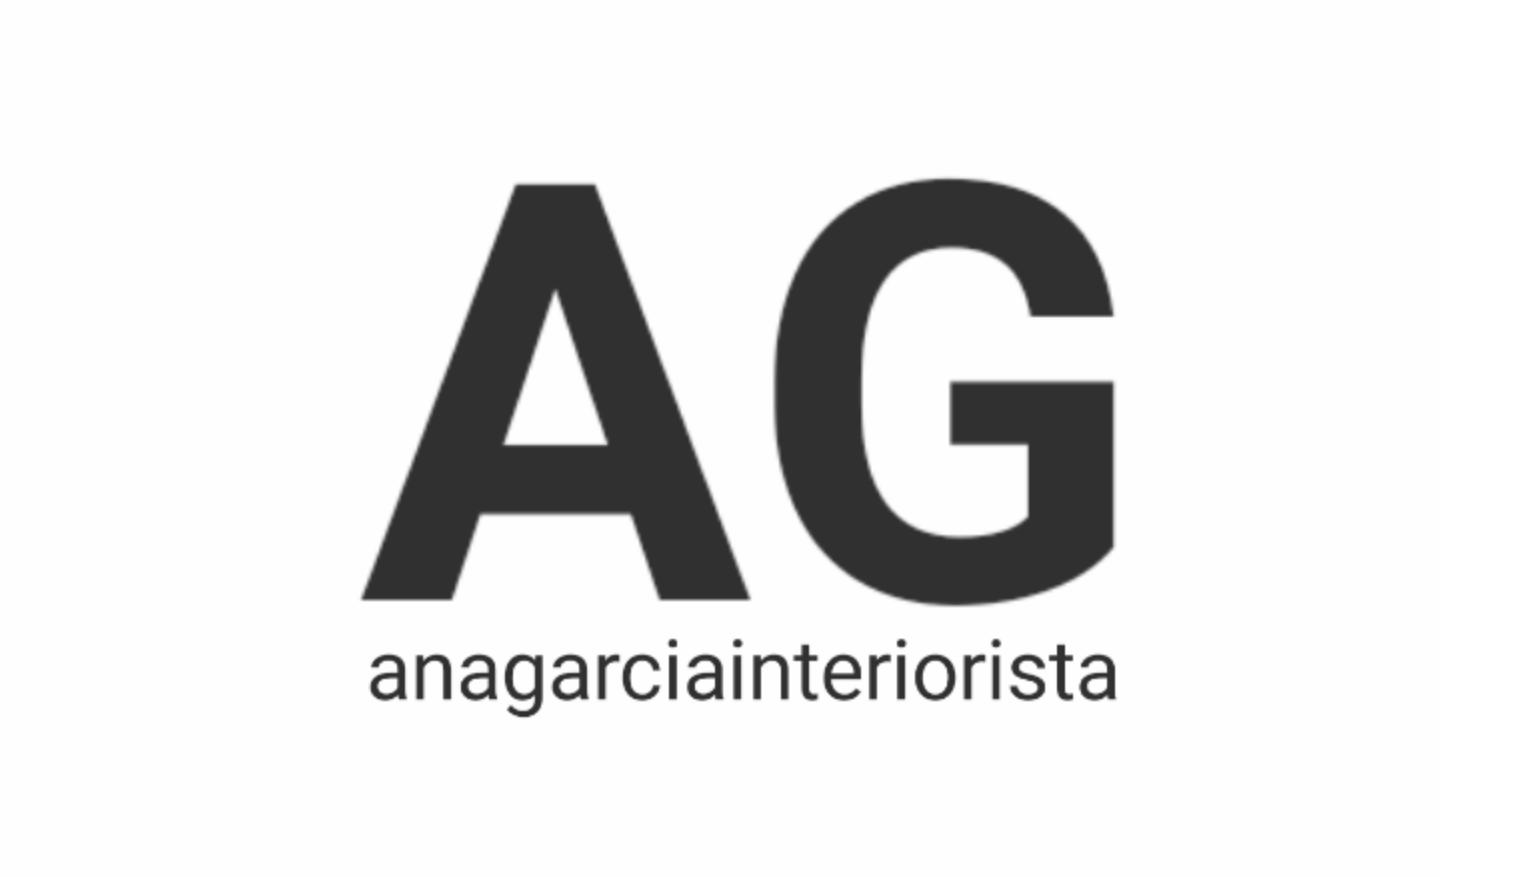 Ana García Interiorista